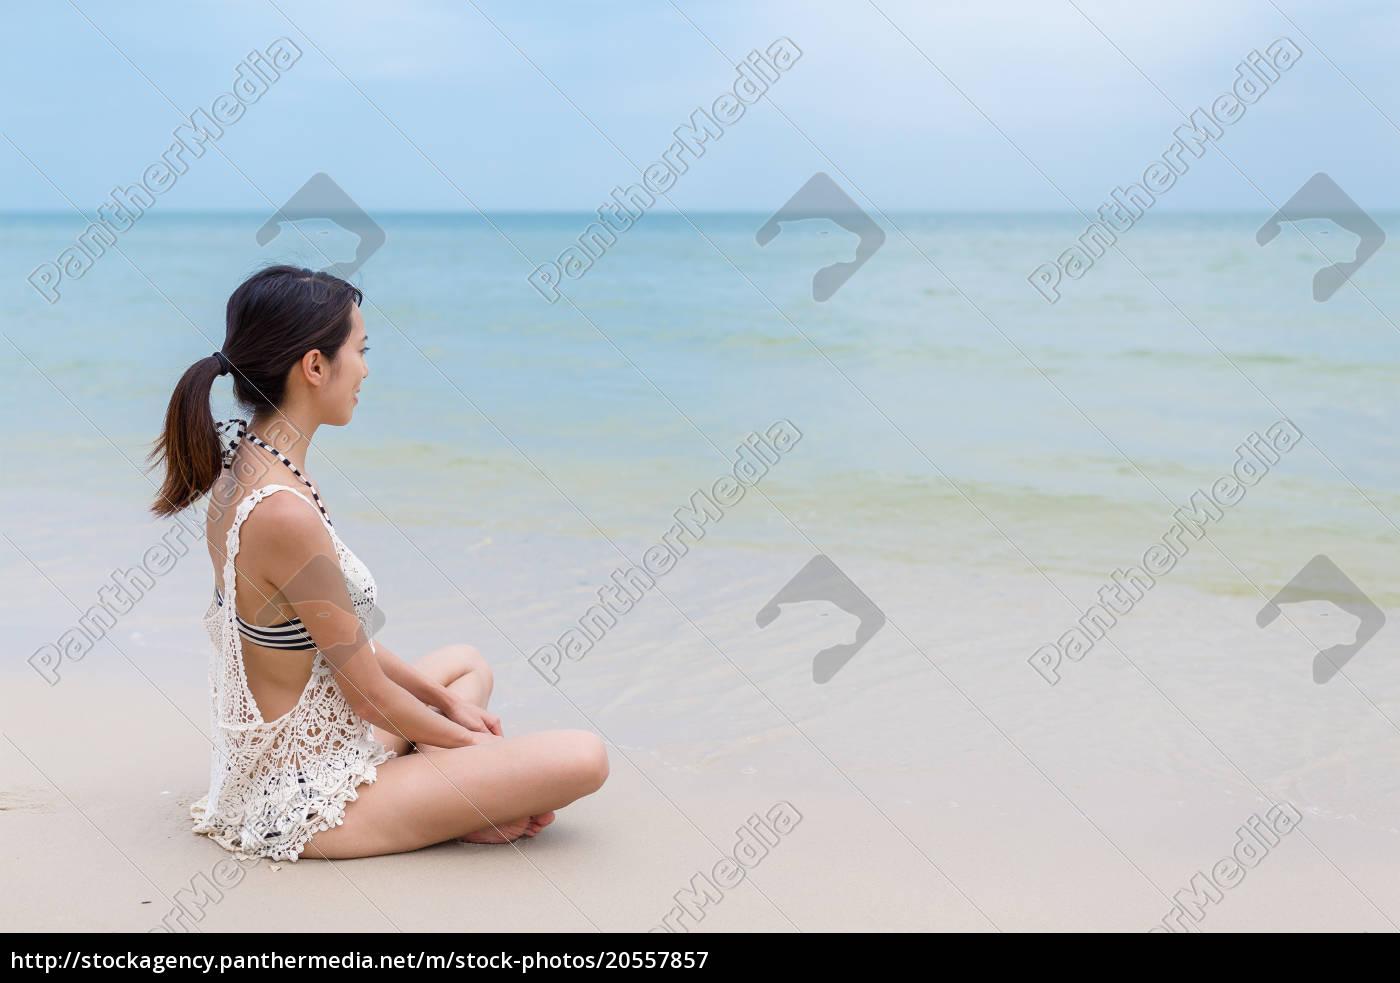 woman, enjoy, on, sand, beach - 20557857